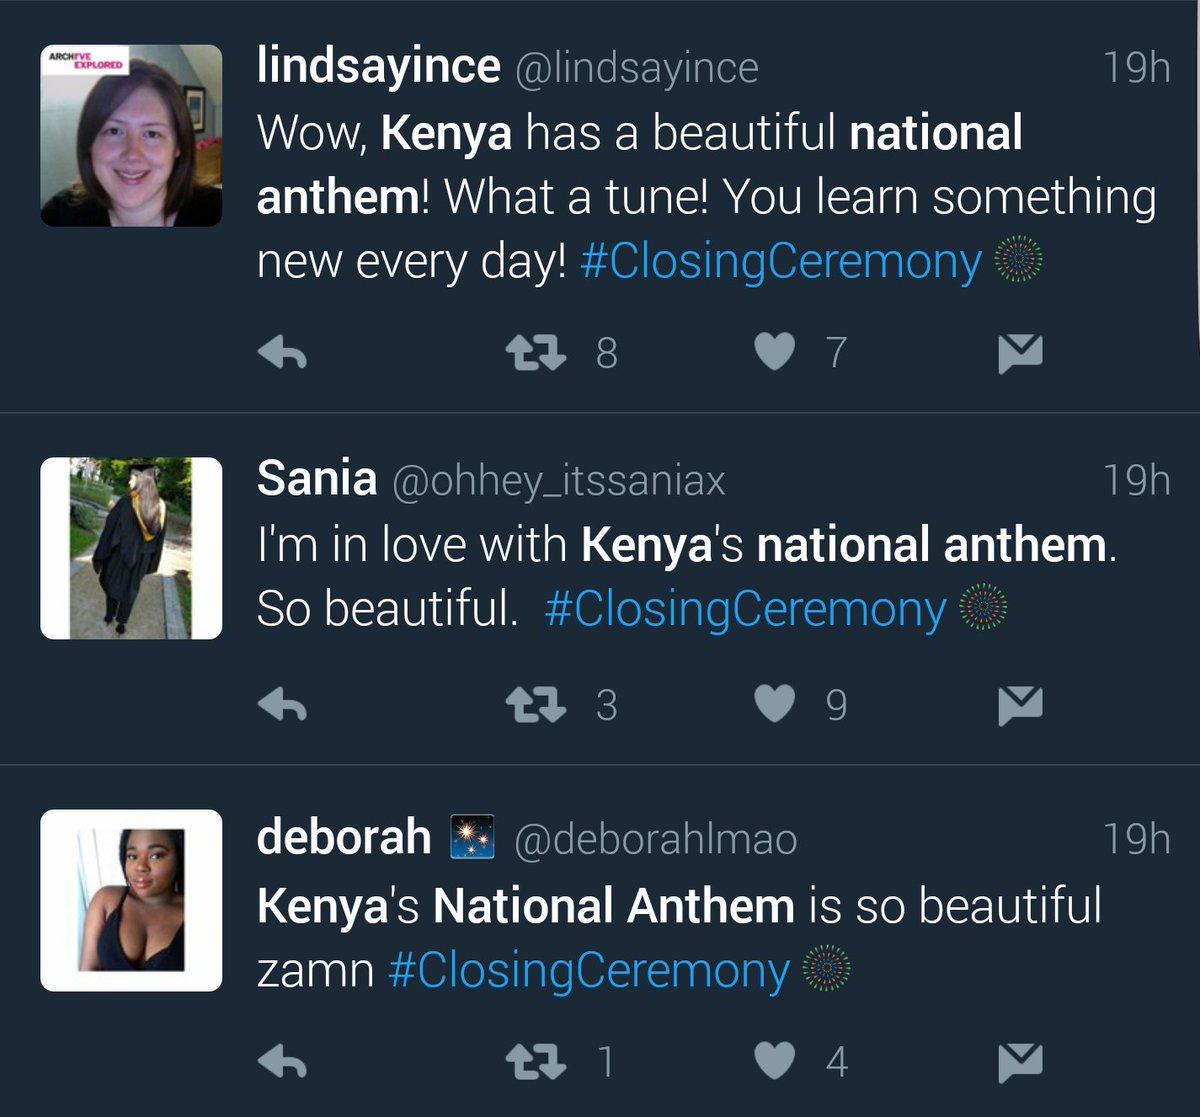 Oh wow ✊✊ RT @wwaibochi: THIS MAKES ME SO HAPPY  #Rio2016 #Kenya https://t.co/NkolY6J3r2